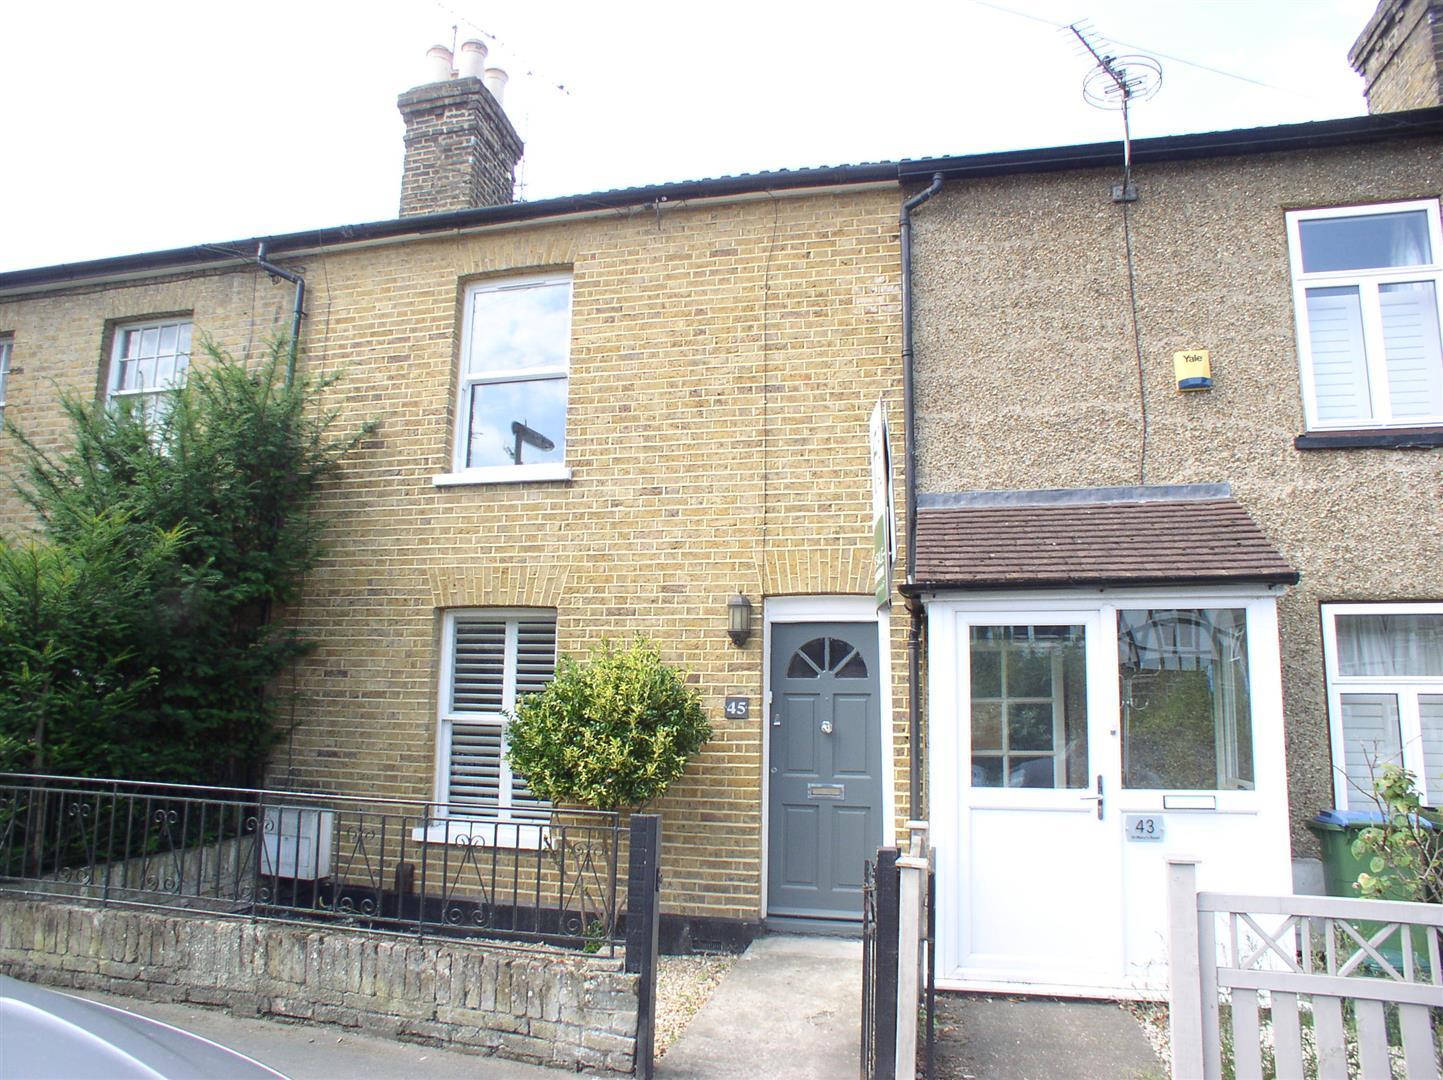 3 Bedrooms House for sale in St. Marys Road, Weybridge